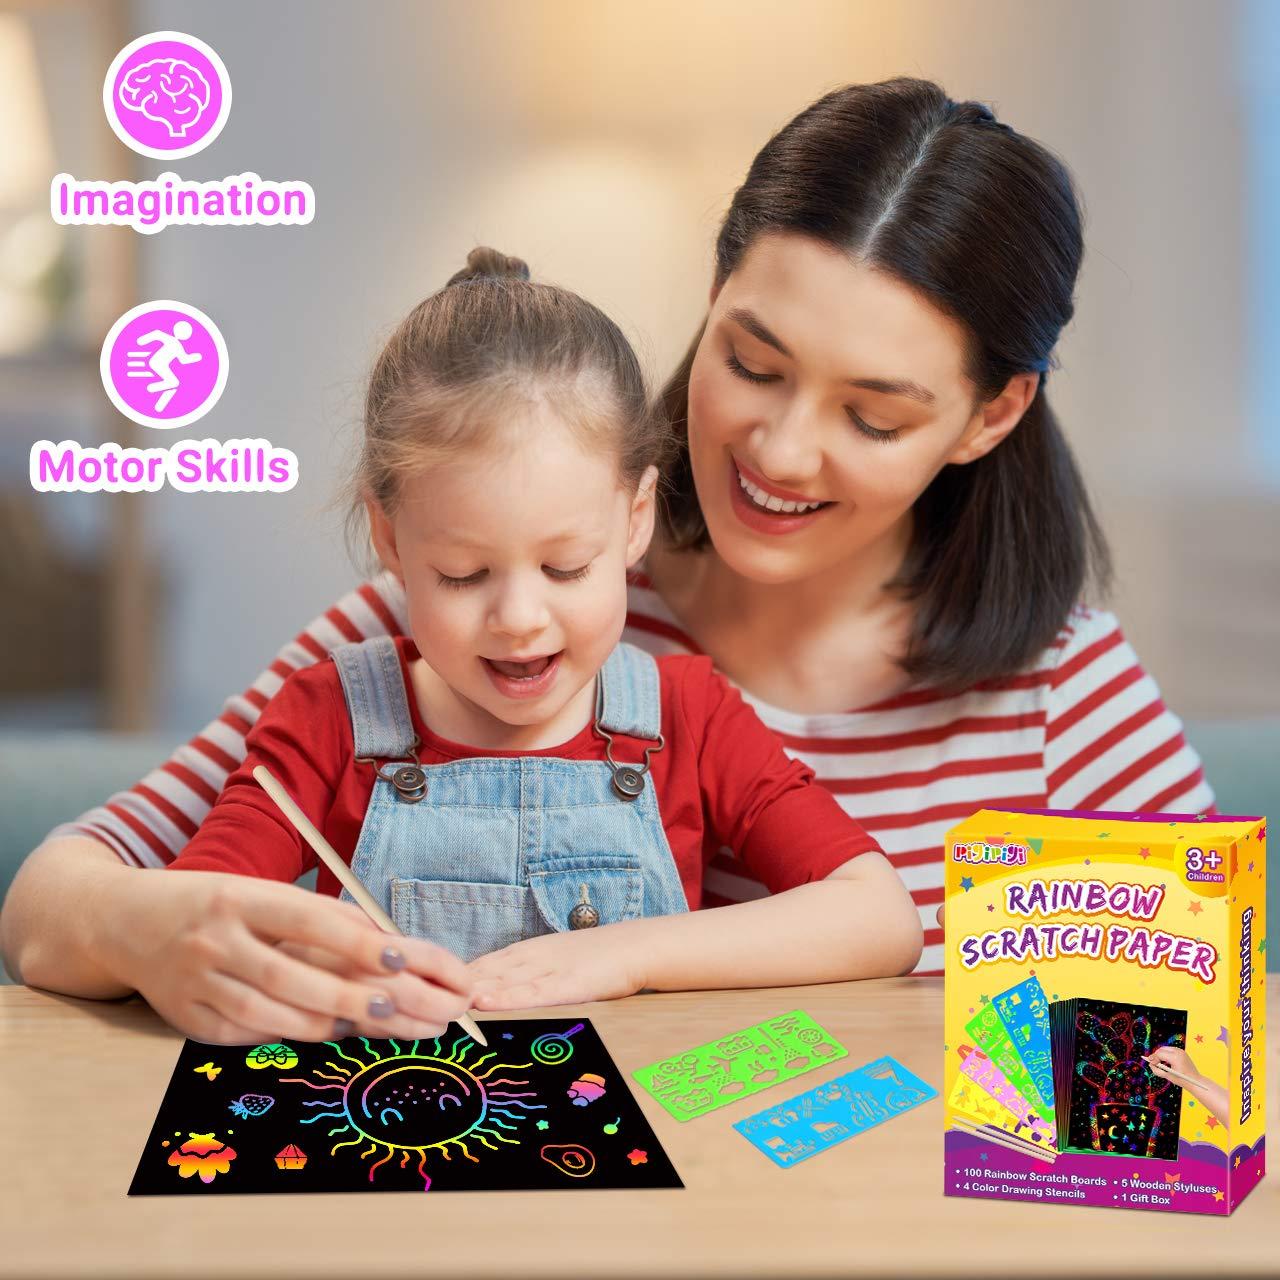 pigipigiRainbowScratchPaperArt -109PcsMagicScratchOffCraft Kit for Kids Color Drawing Note Pad Supply forChildrenGirlsBoysDIYPartyFavorGameActivityBirthdayChristmasToyGiftSet